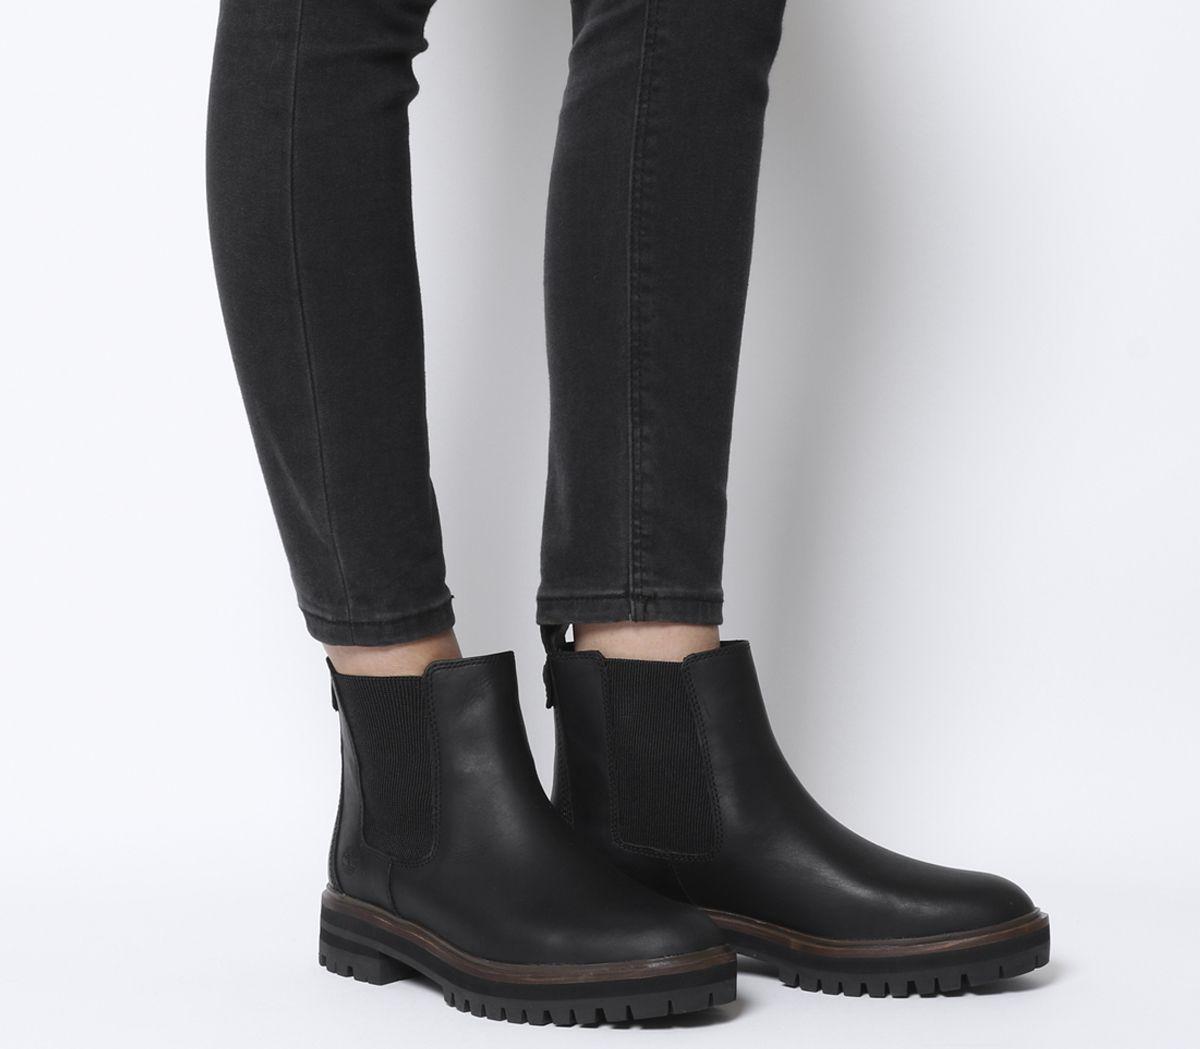 c834f687d7f London Square Chelsea Boots